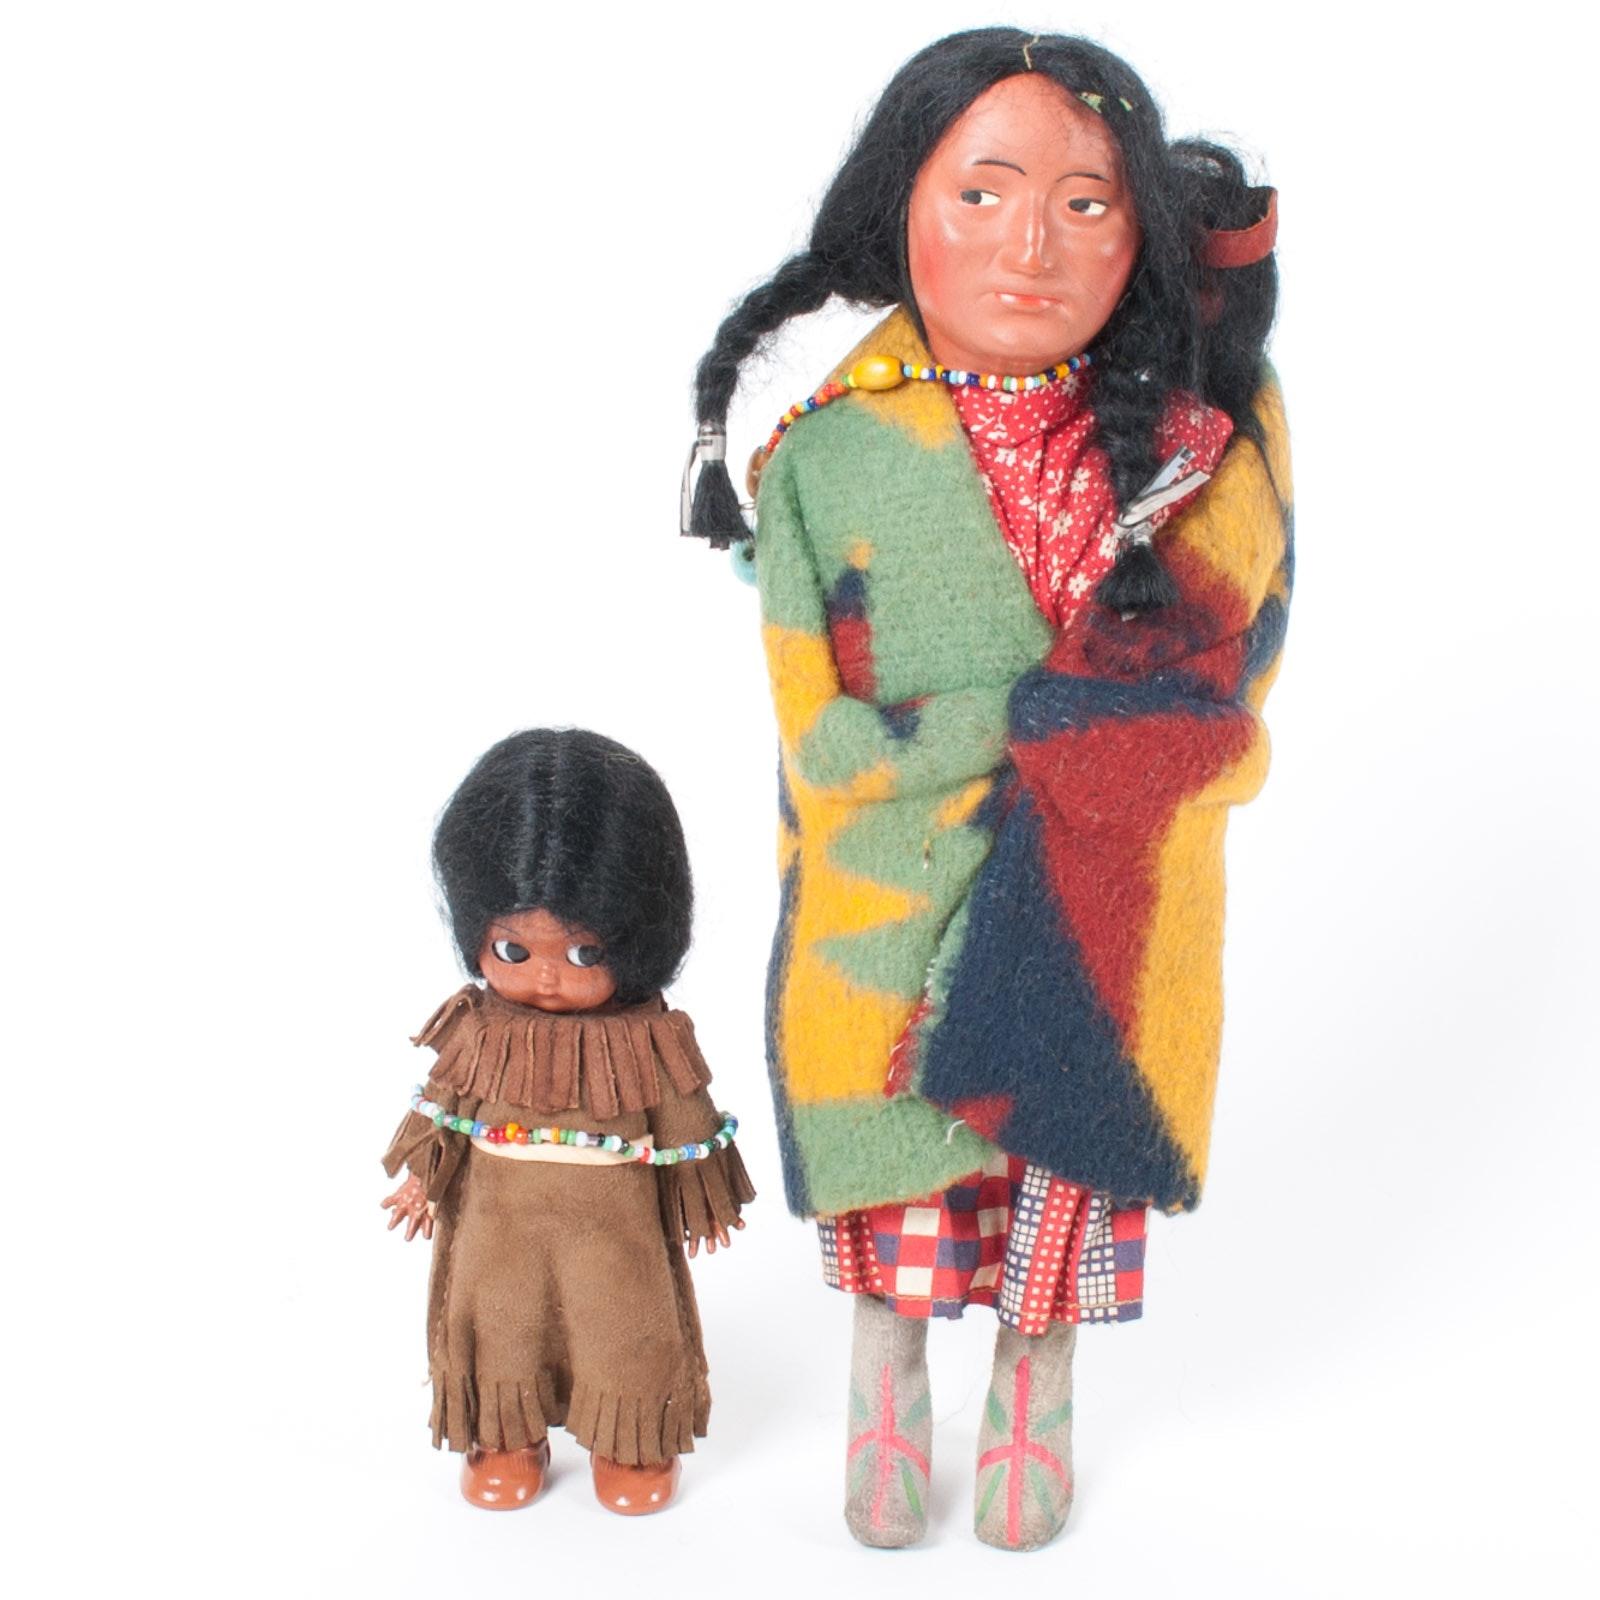 Vintage Skookum Native American Style Doll Including